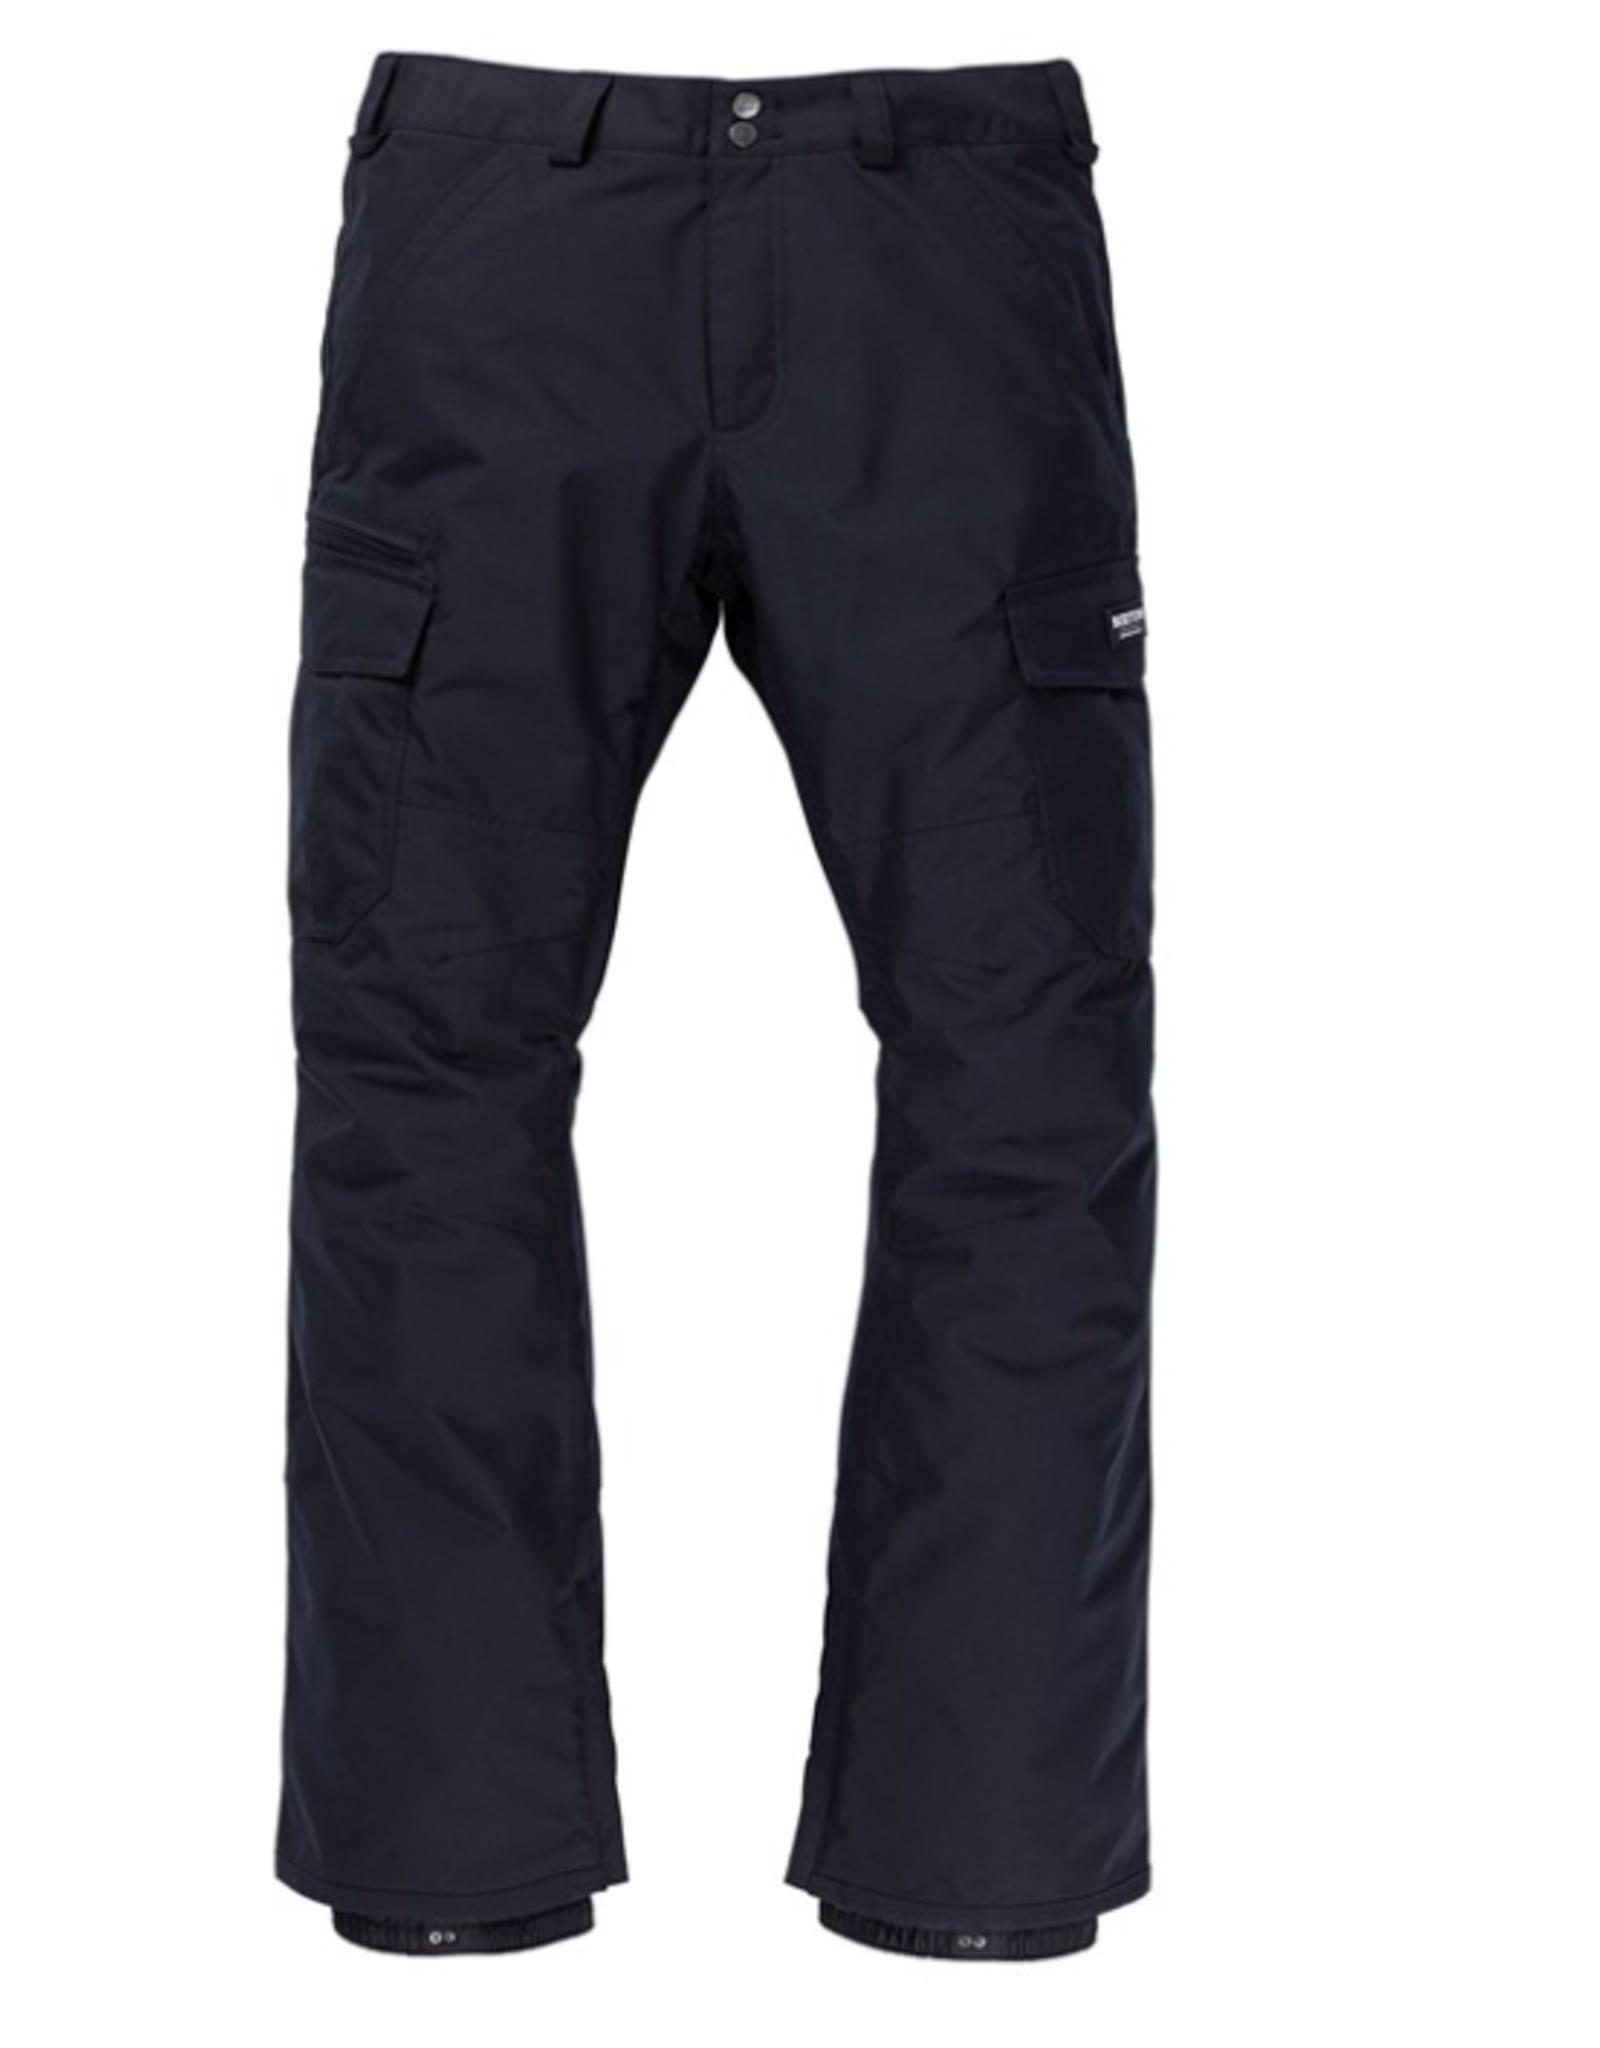 BURTON Burton Men's Cargo Pant Regular True Black 2022